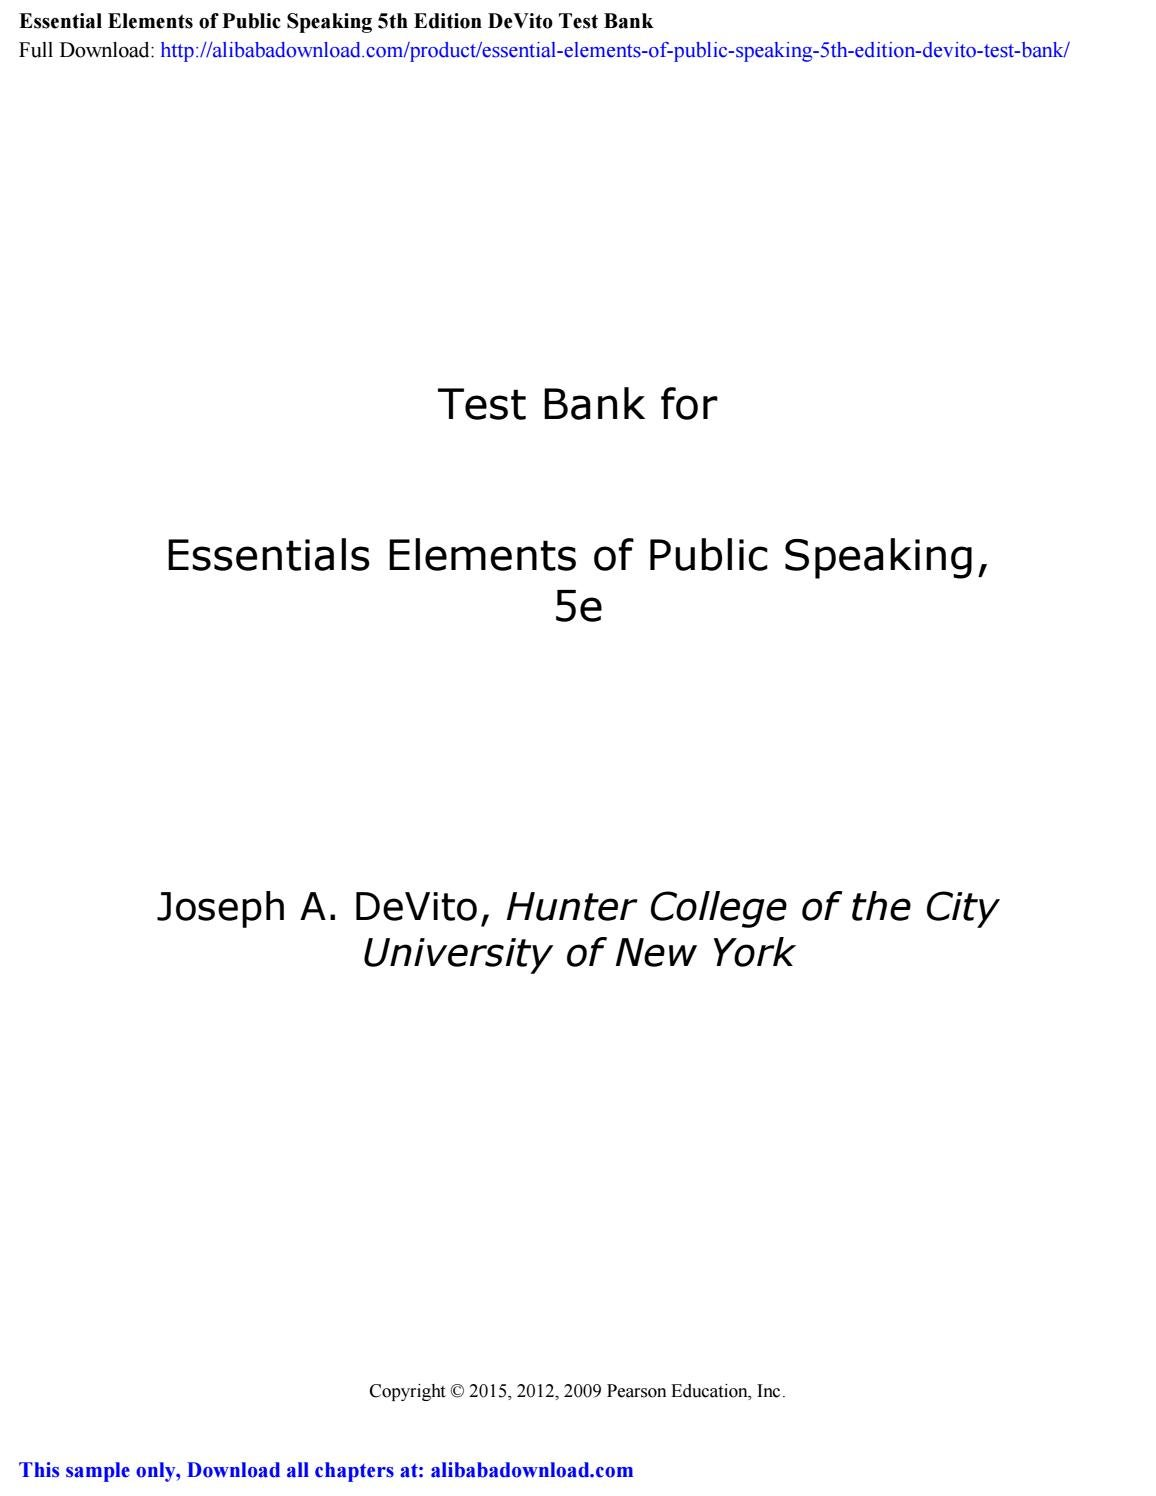 Essential Elements of Public Speaking 5th Edition DeVito ...